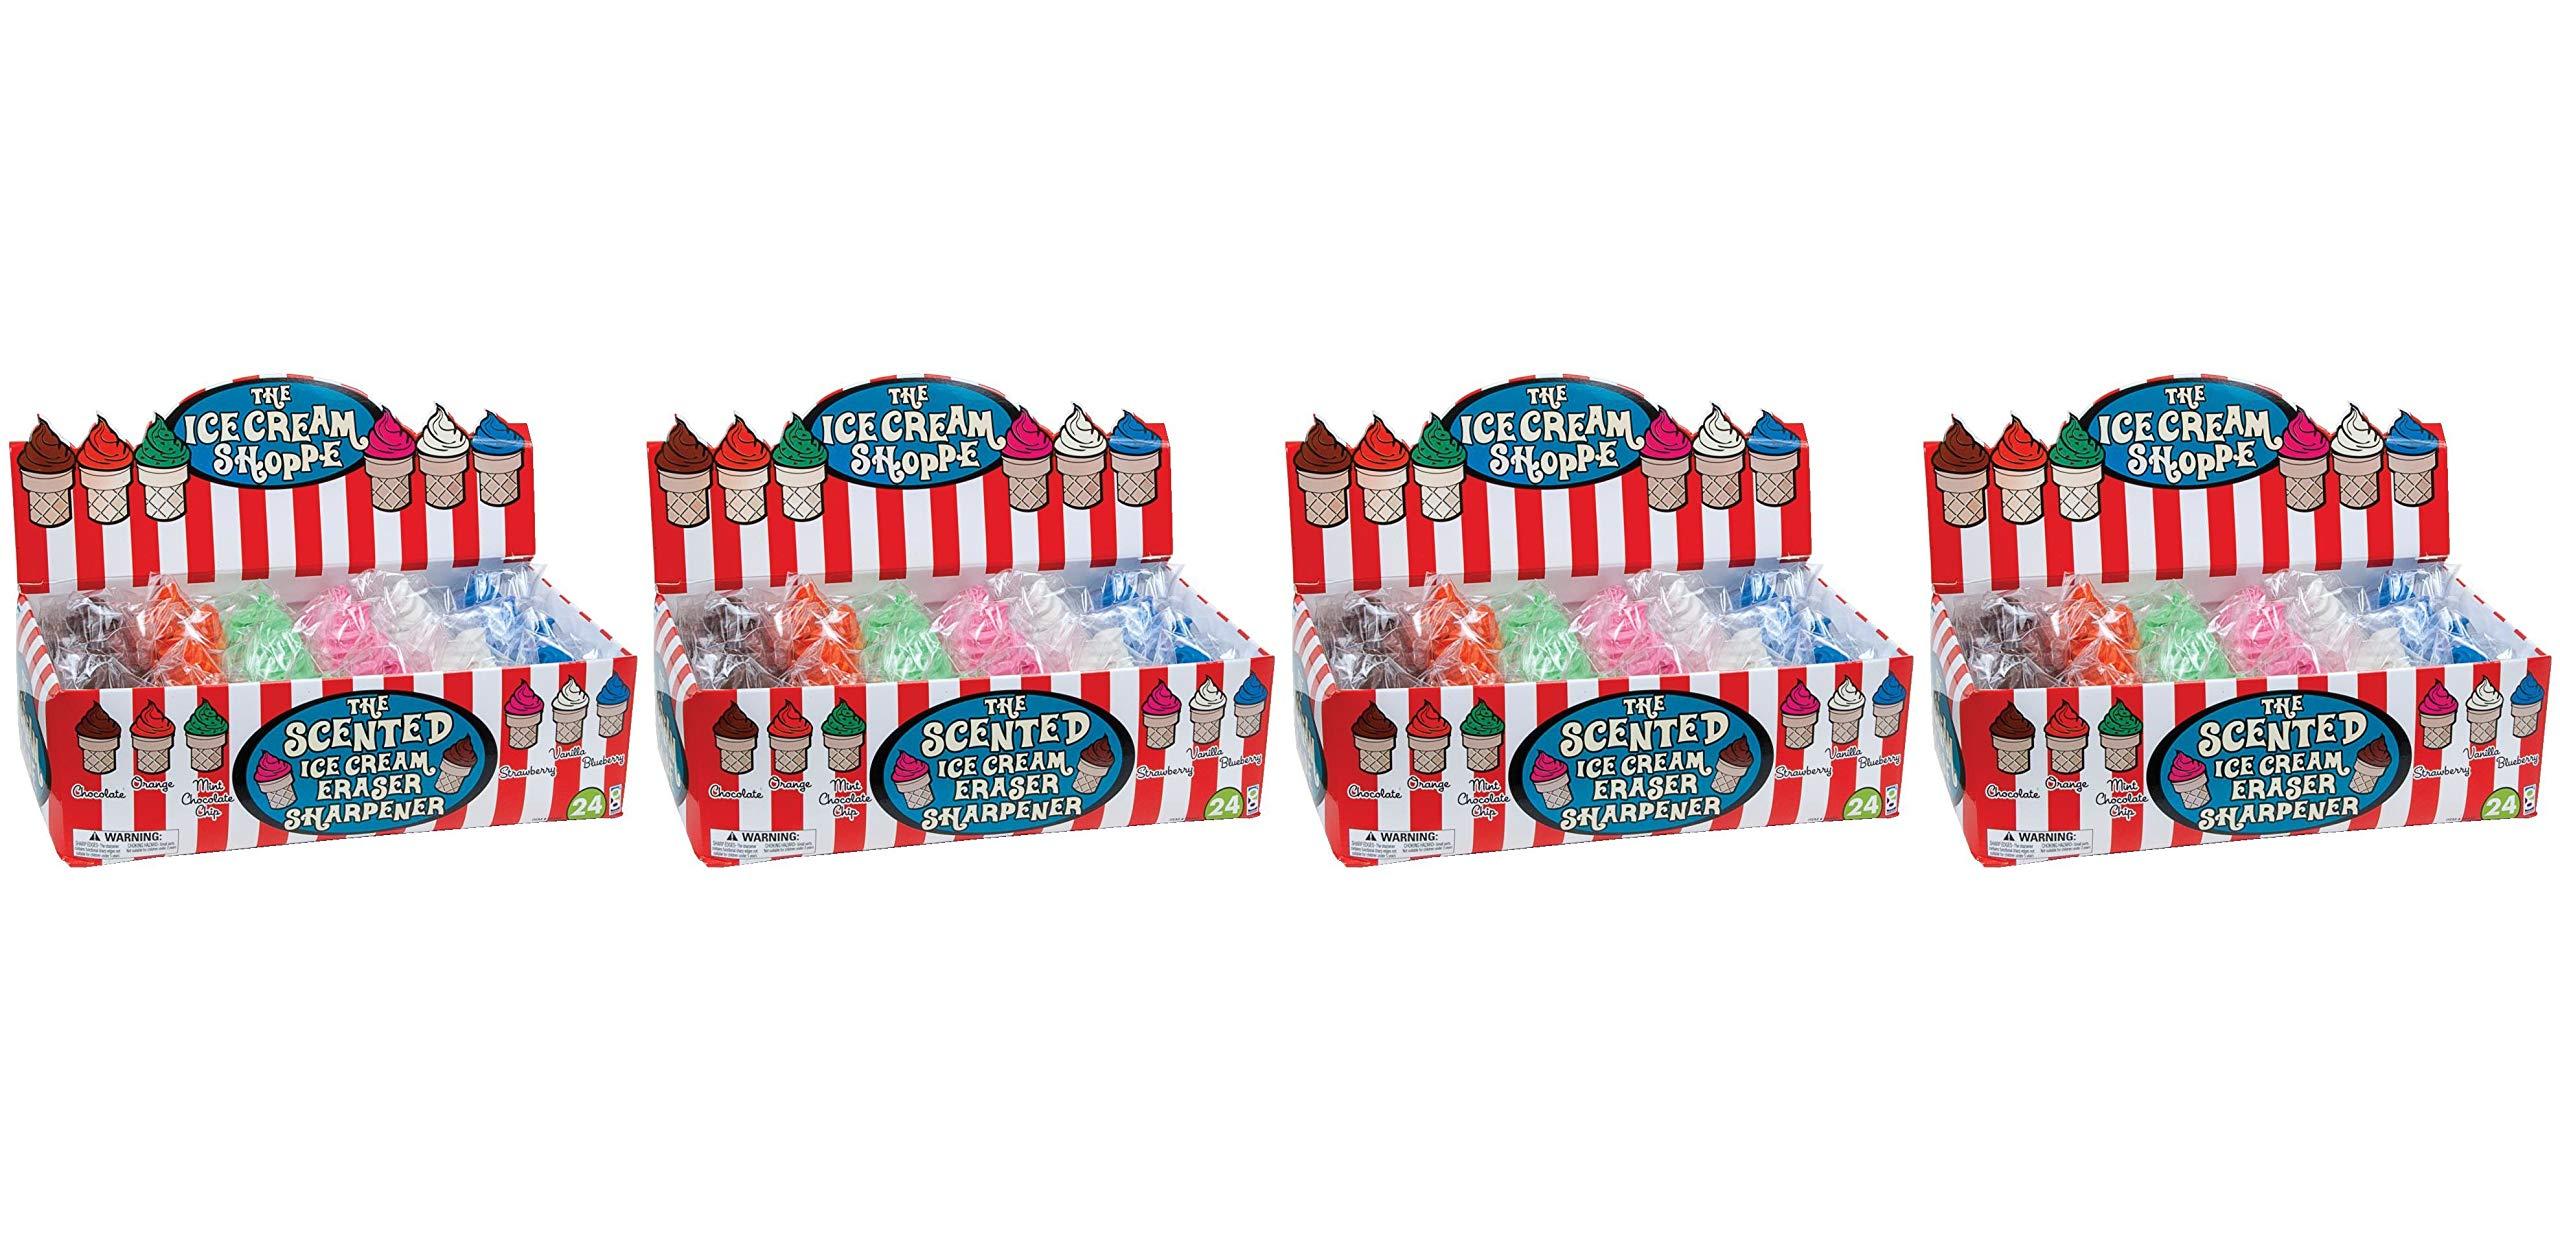 Raymond Geddes Ice Cream Shoppe Scented Eraser with Pencil Sharpener, 24 Pack (68662) (Fоur Paсk) by Raymond Geddes